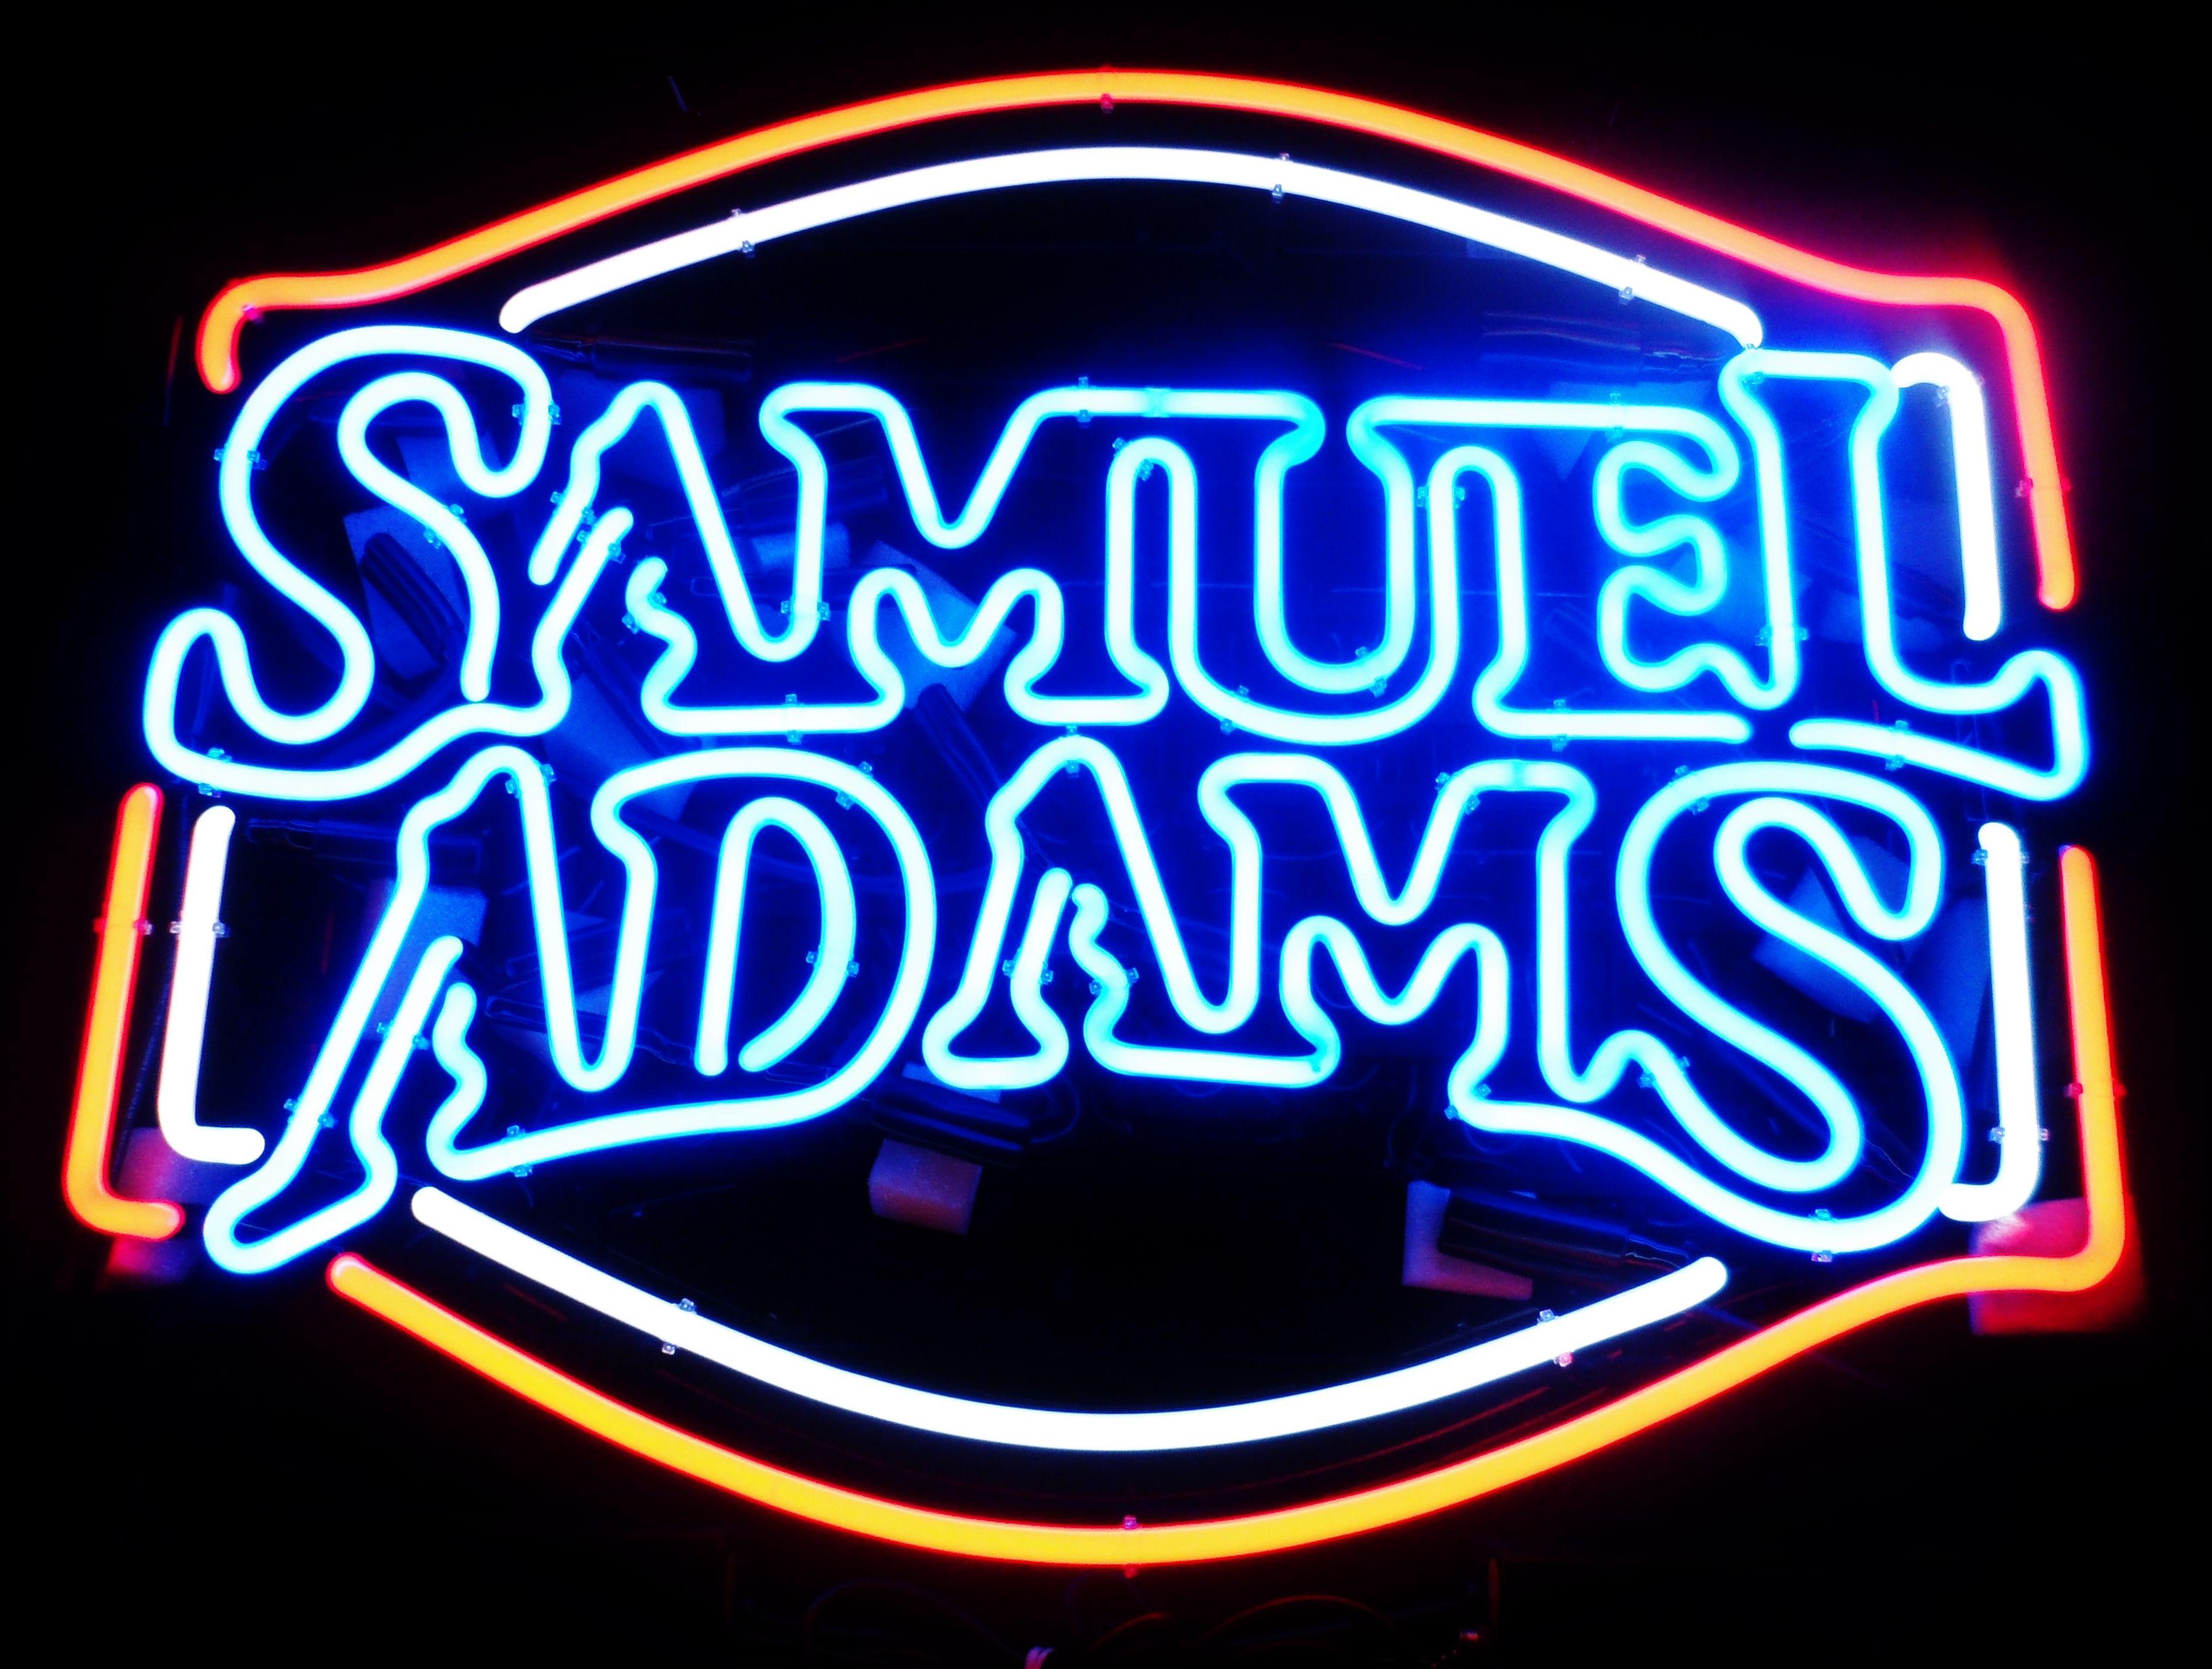 samuel adams neon bar sign circa 2012 breweriana. Black Bedroom Furniture Sets. Home Design Ideas